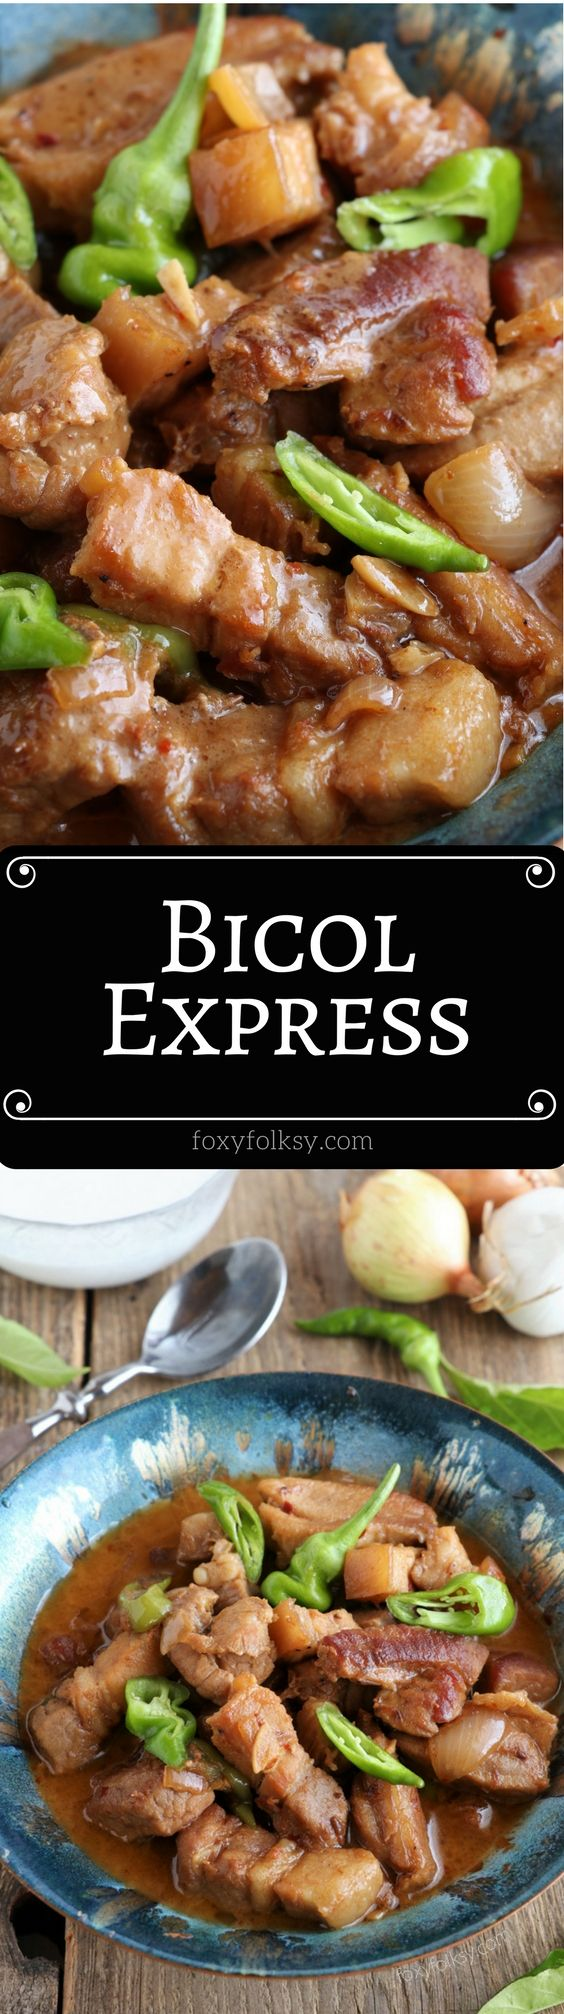 Try this popular Filipino dish, Bicol Express! A spicy pork stew in coconut milk. | www.foxyfolksy.com